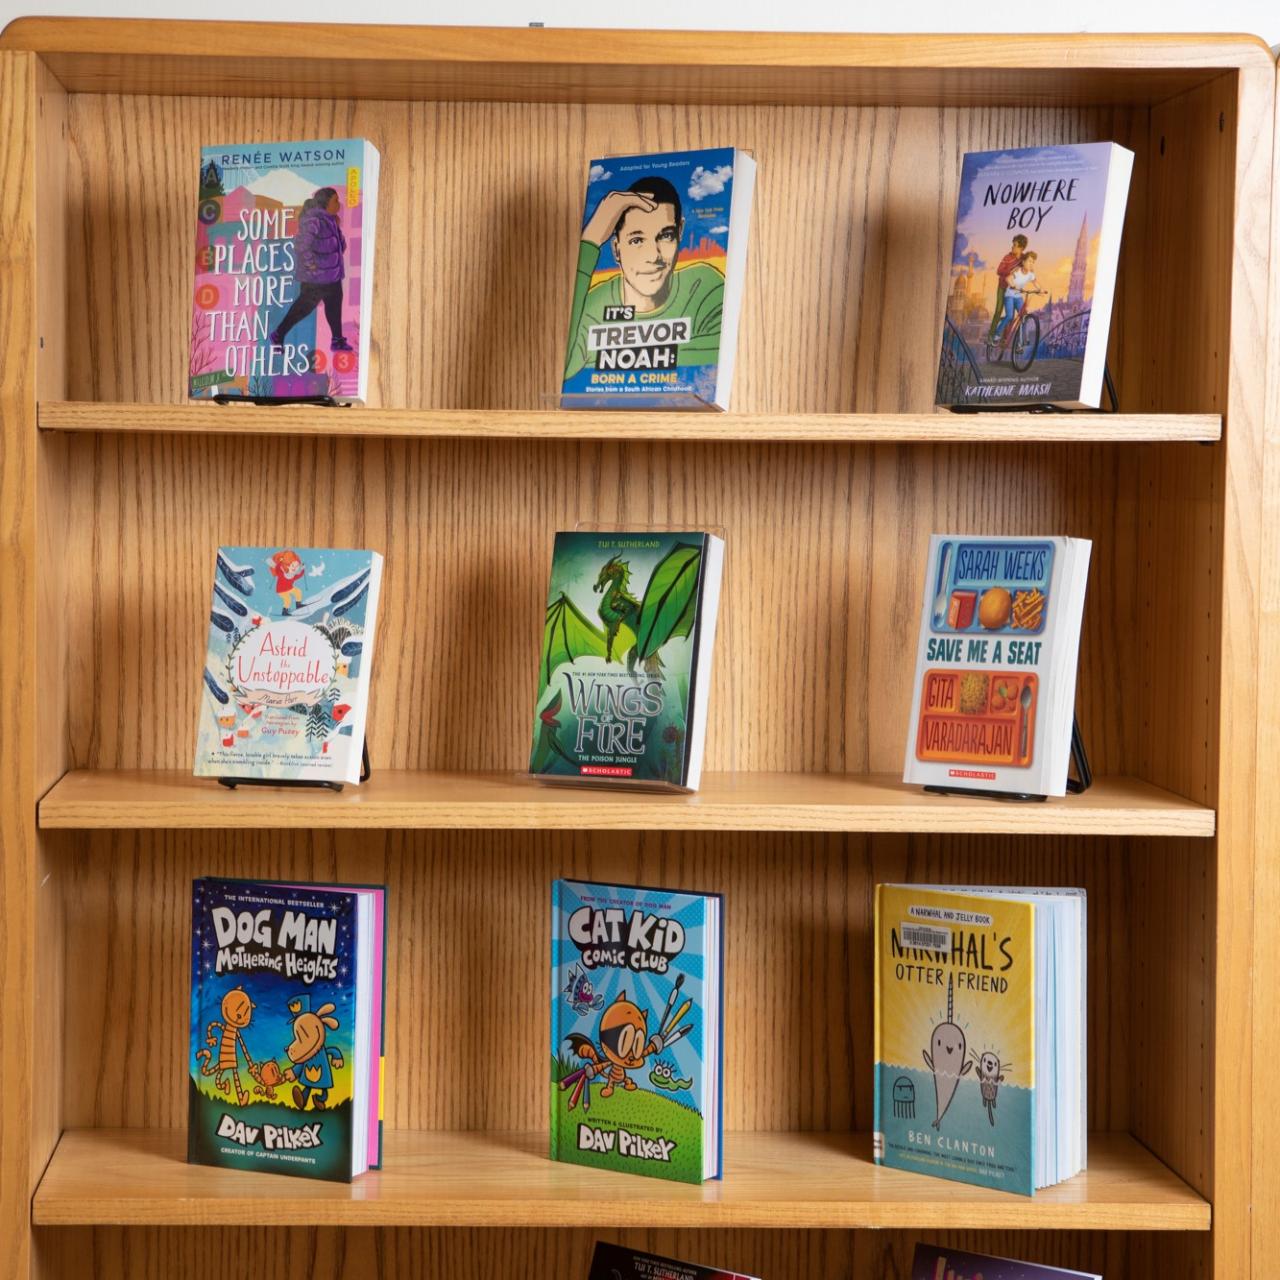 9 YA books displayed on bookshelf